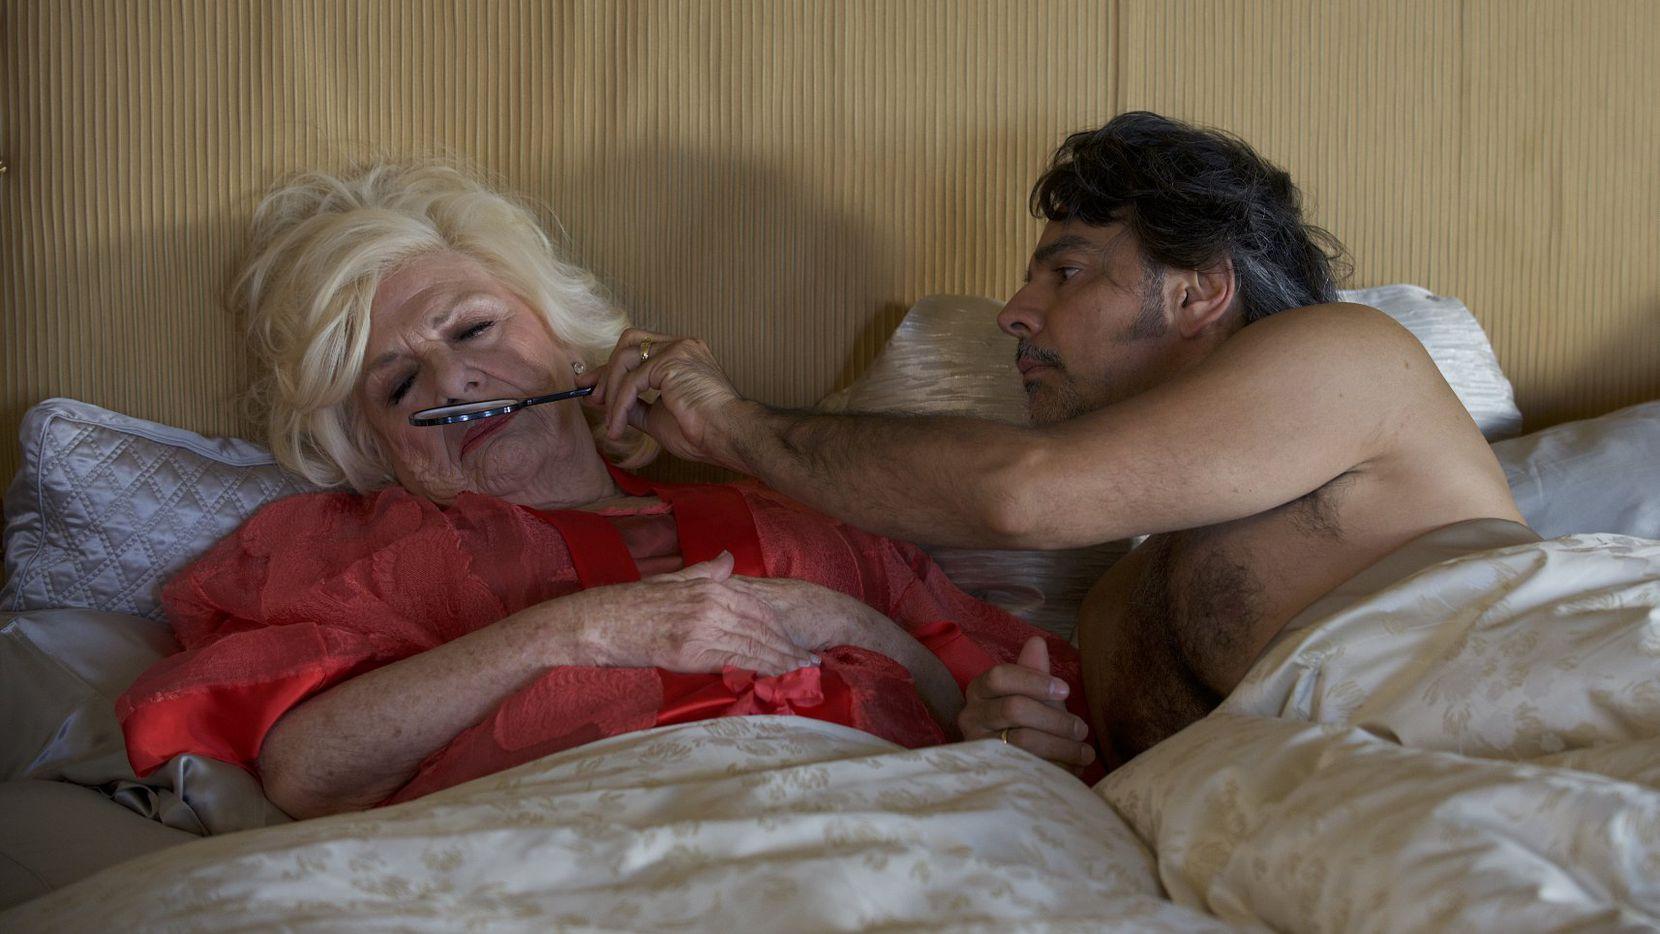 Eugenio Derbez protagoniza la película 'How to Be a Latin Lover'. Fotos PANTELION FILMS